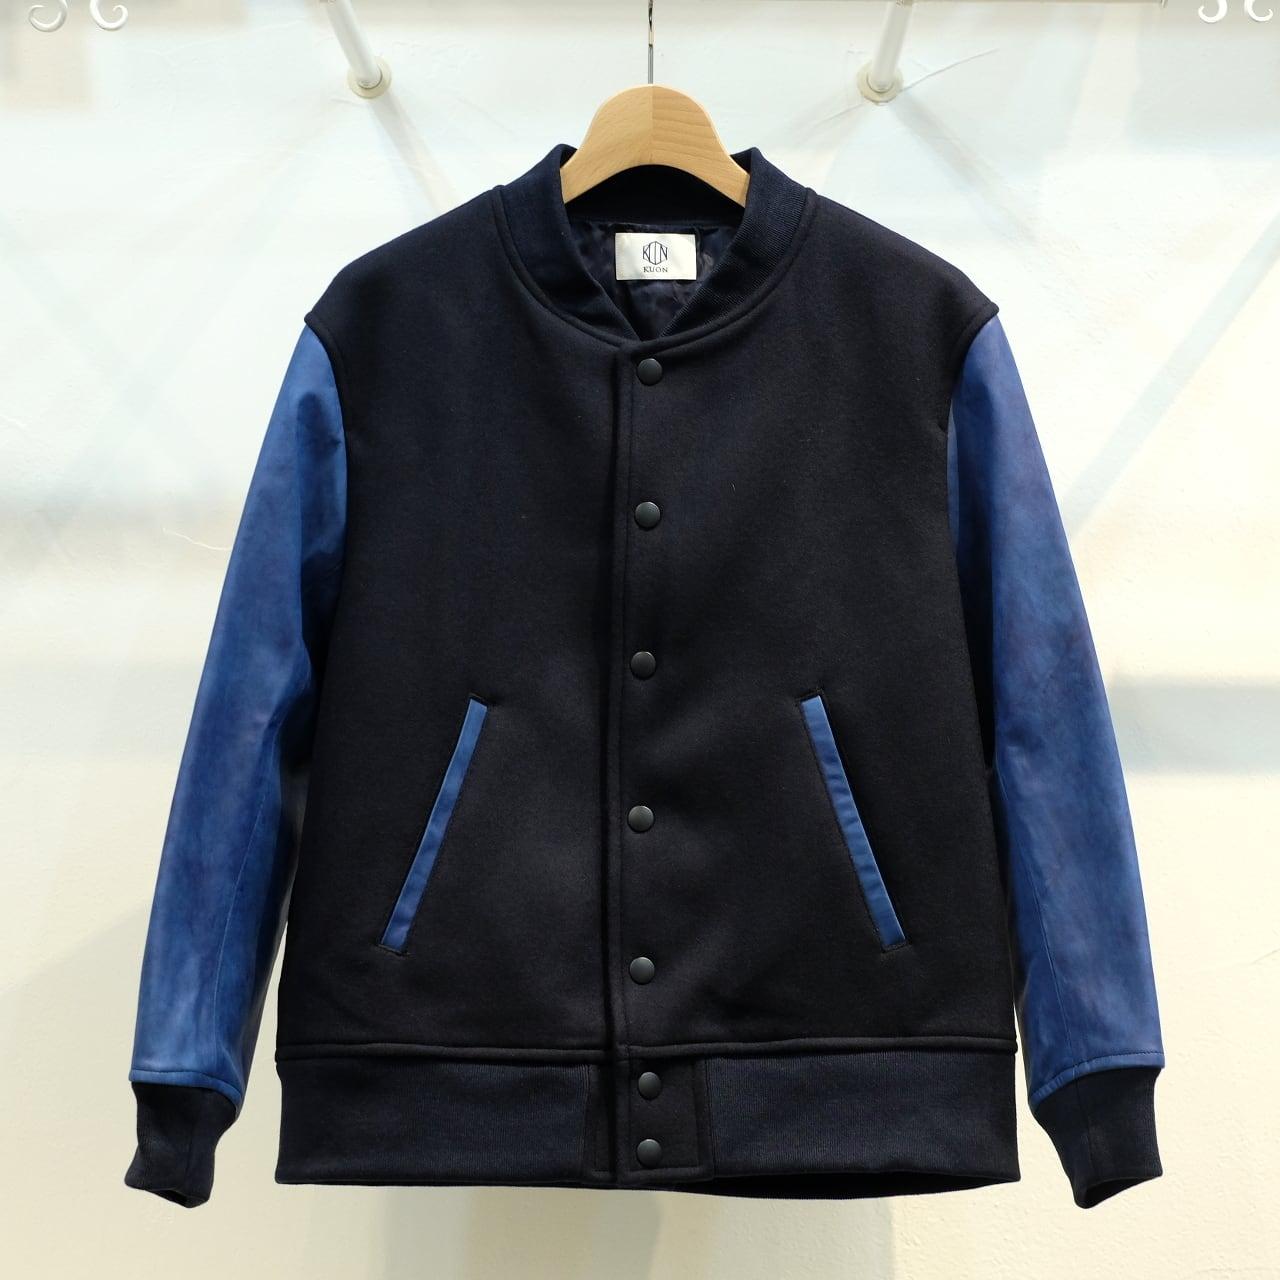 KUON(クオン) 袖レザー・メルトンブルゾン(スタジャン) 藍染・ネイビー